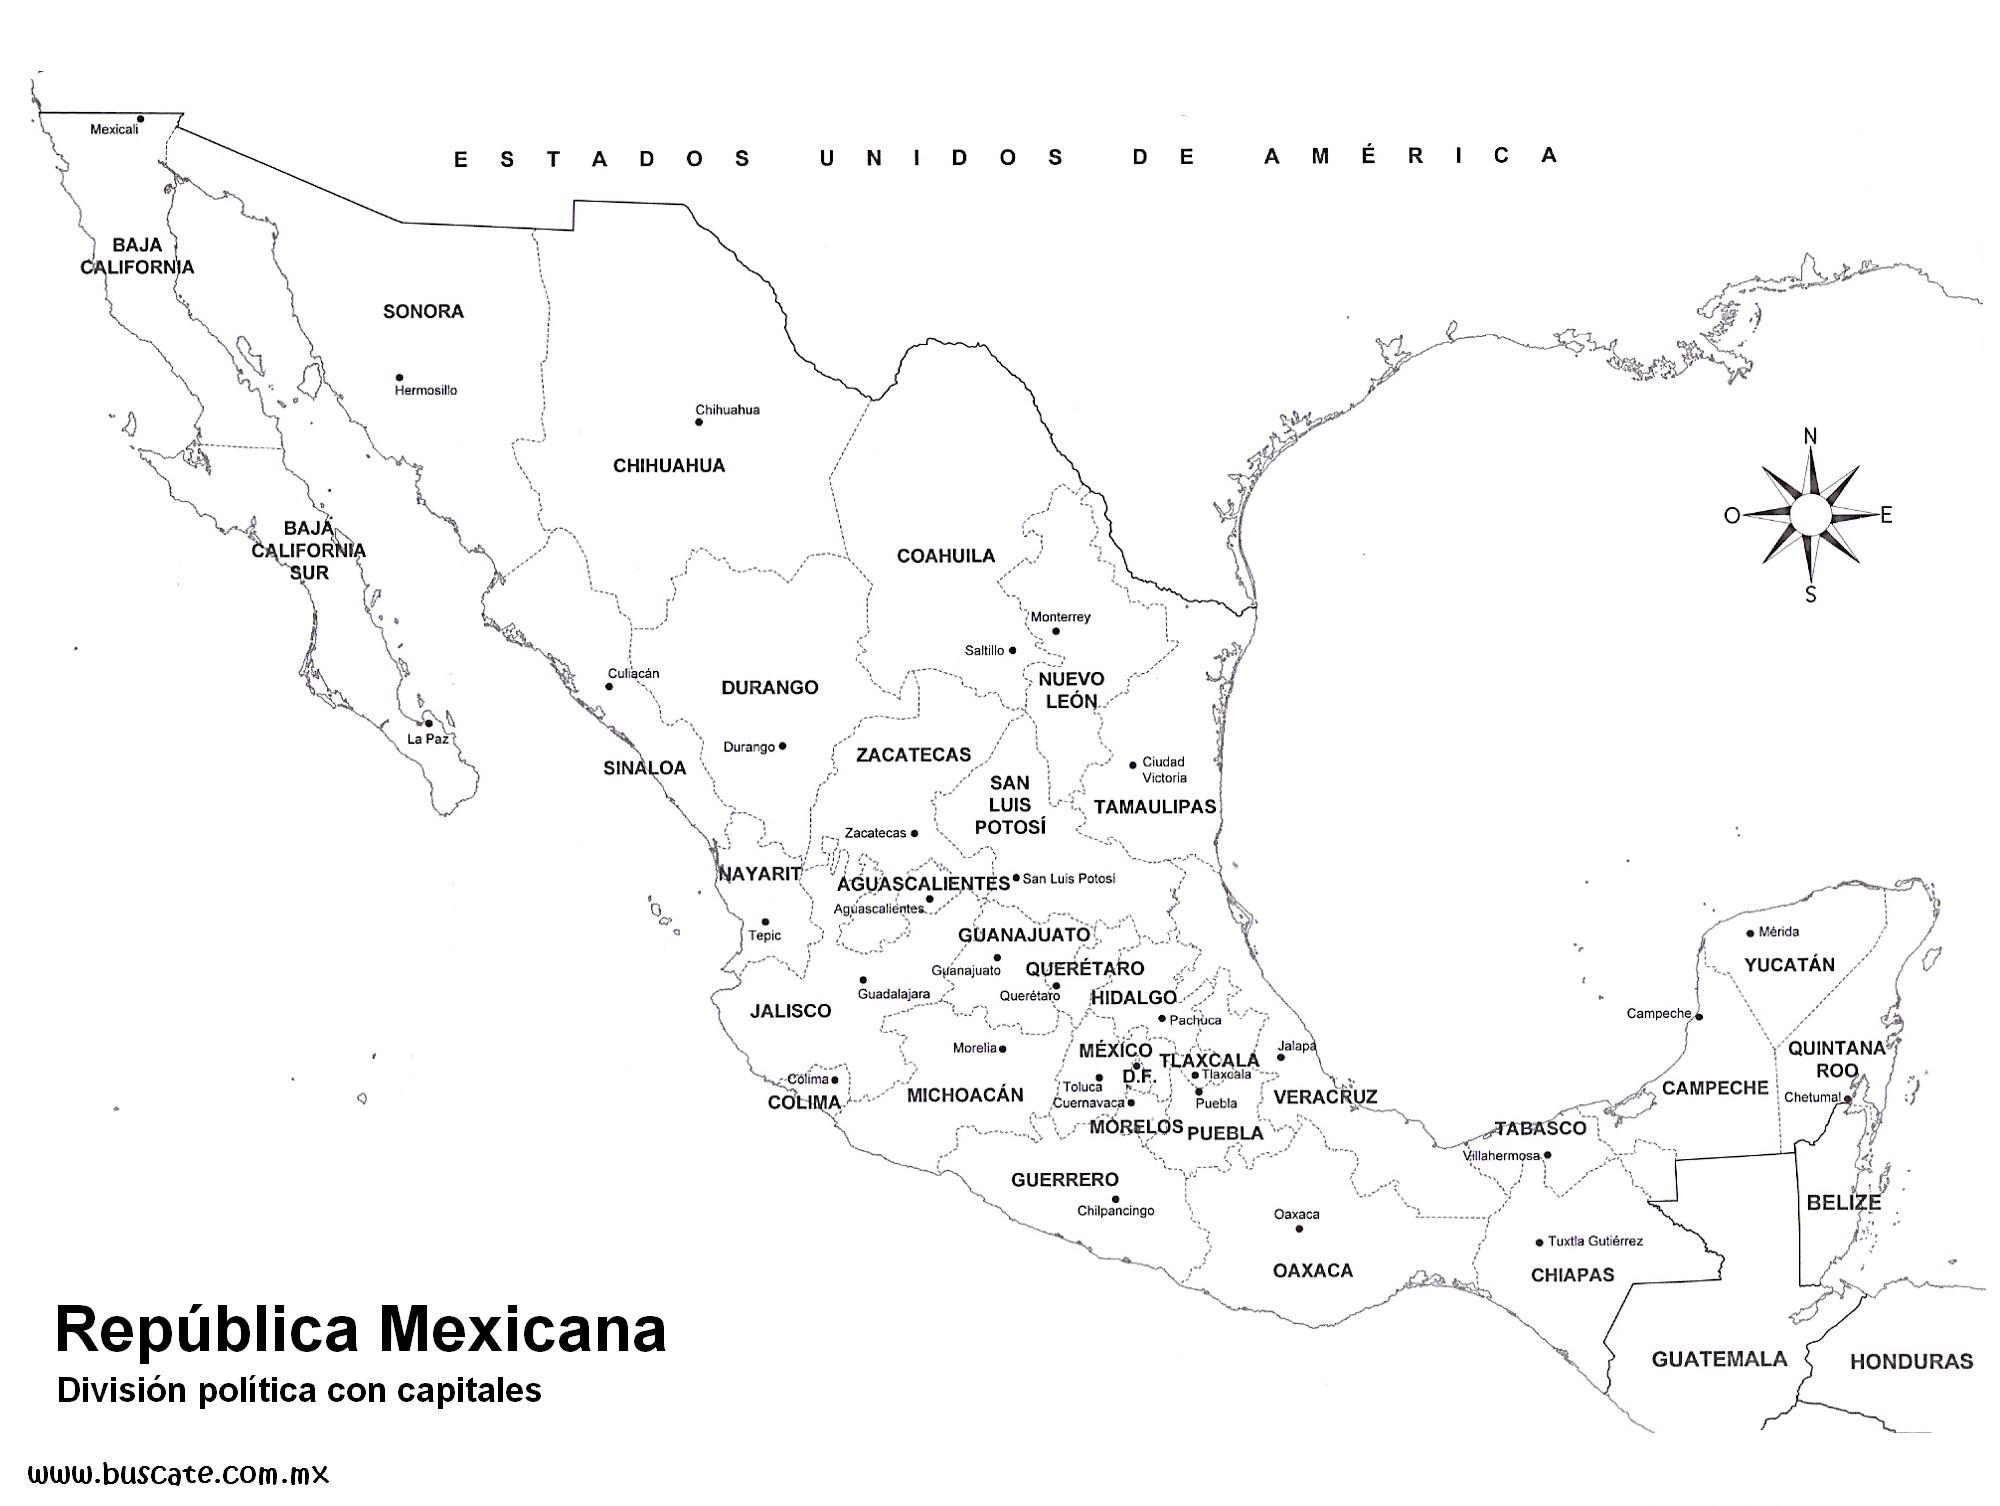 Mapas Escolares - Mapa de mexico